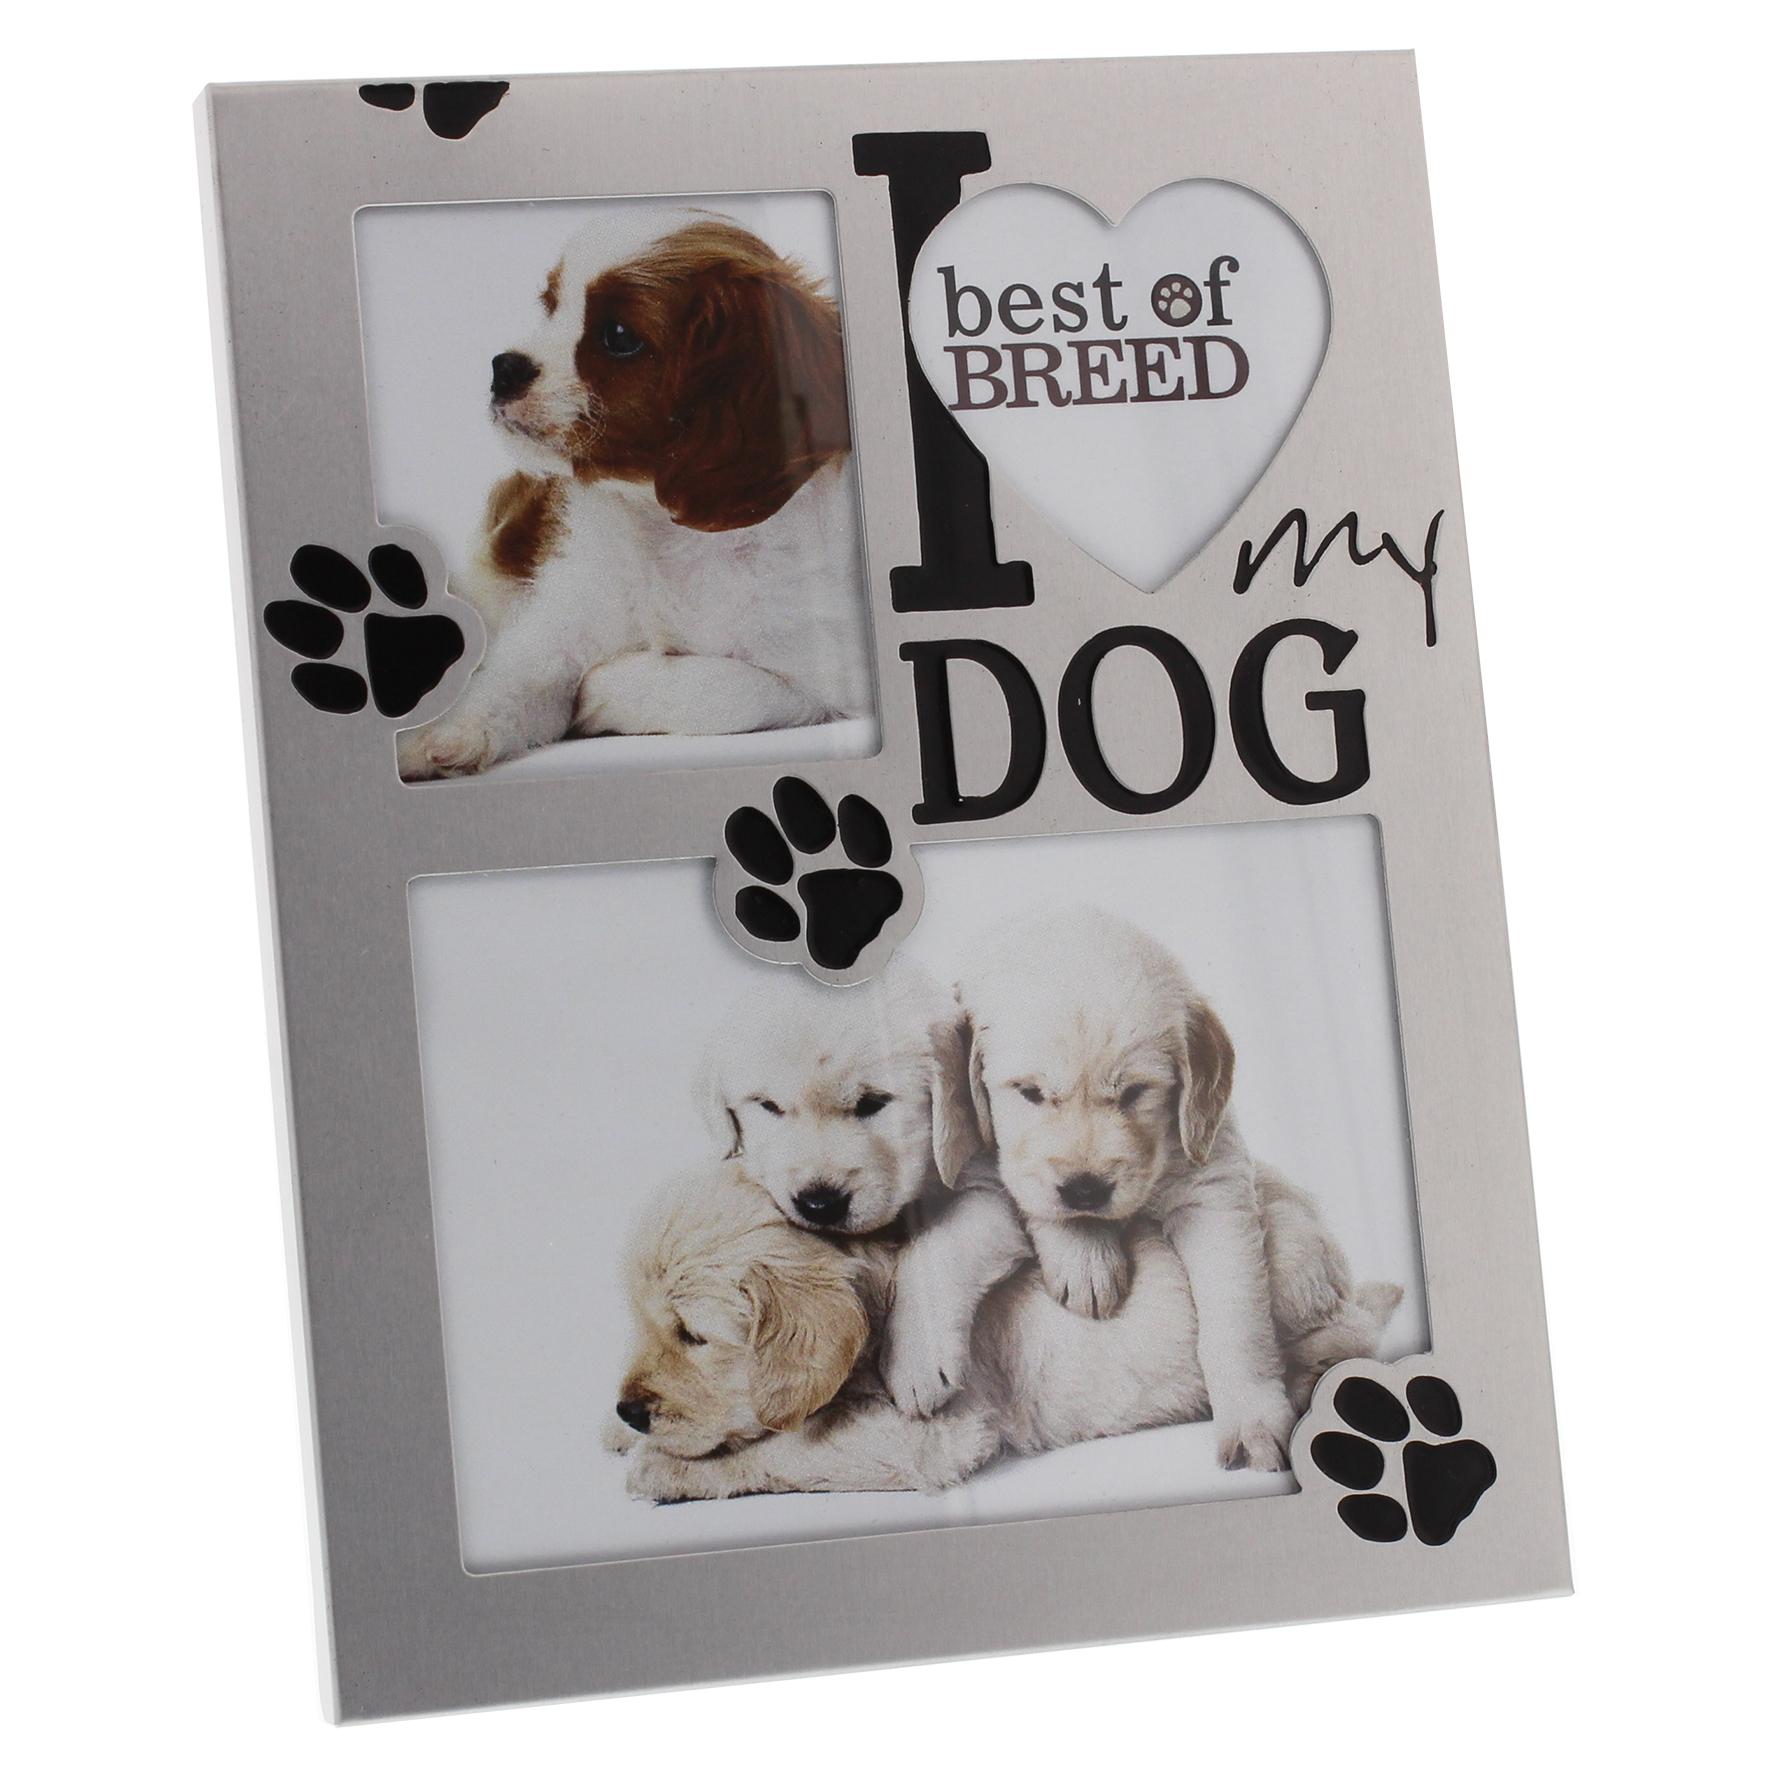 I love my Dog - Fotorahmen für Hundeliebhaber